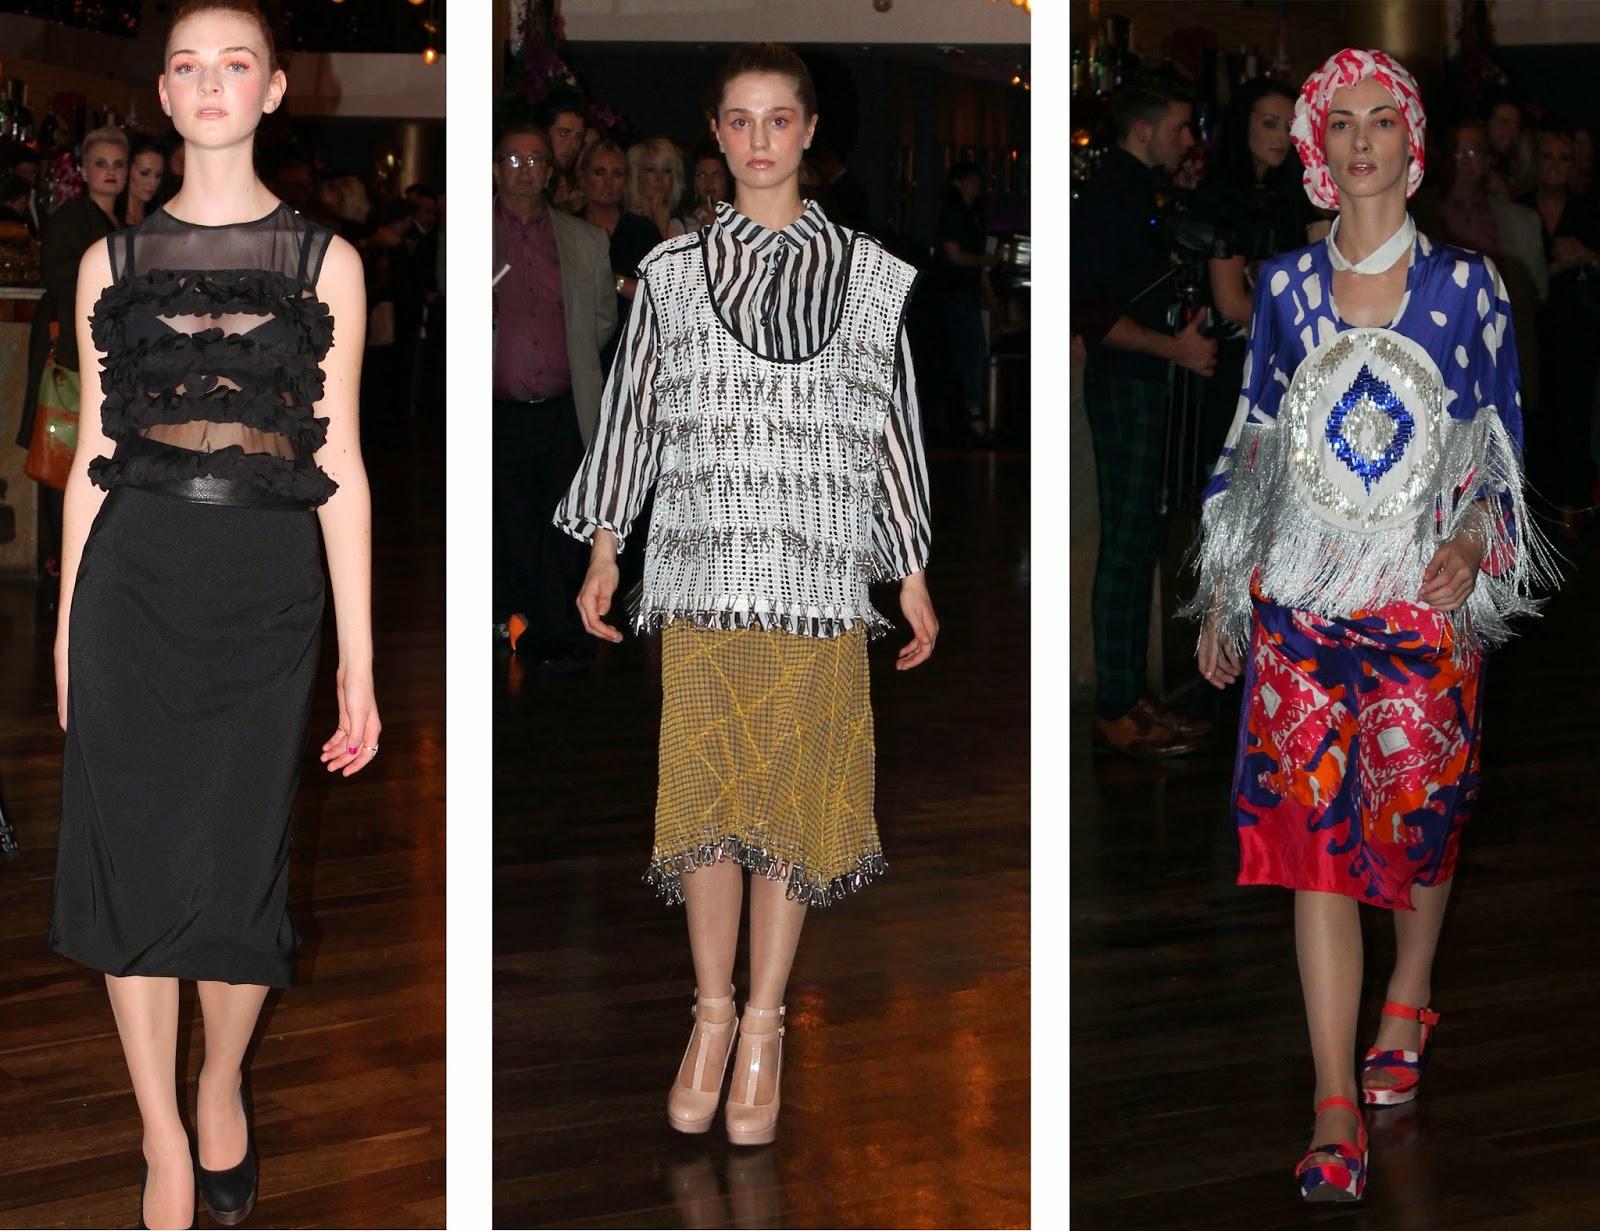 inspo launch fashion show MMU graduates sve fashion, victoria hordern and mahwish aurangzeb